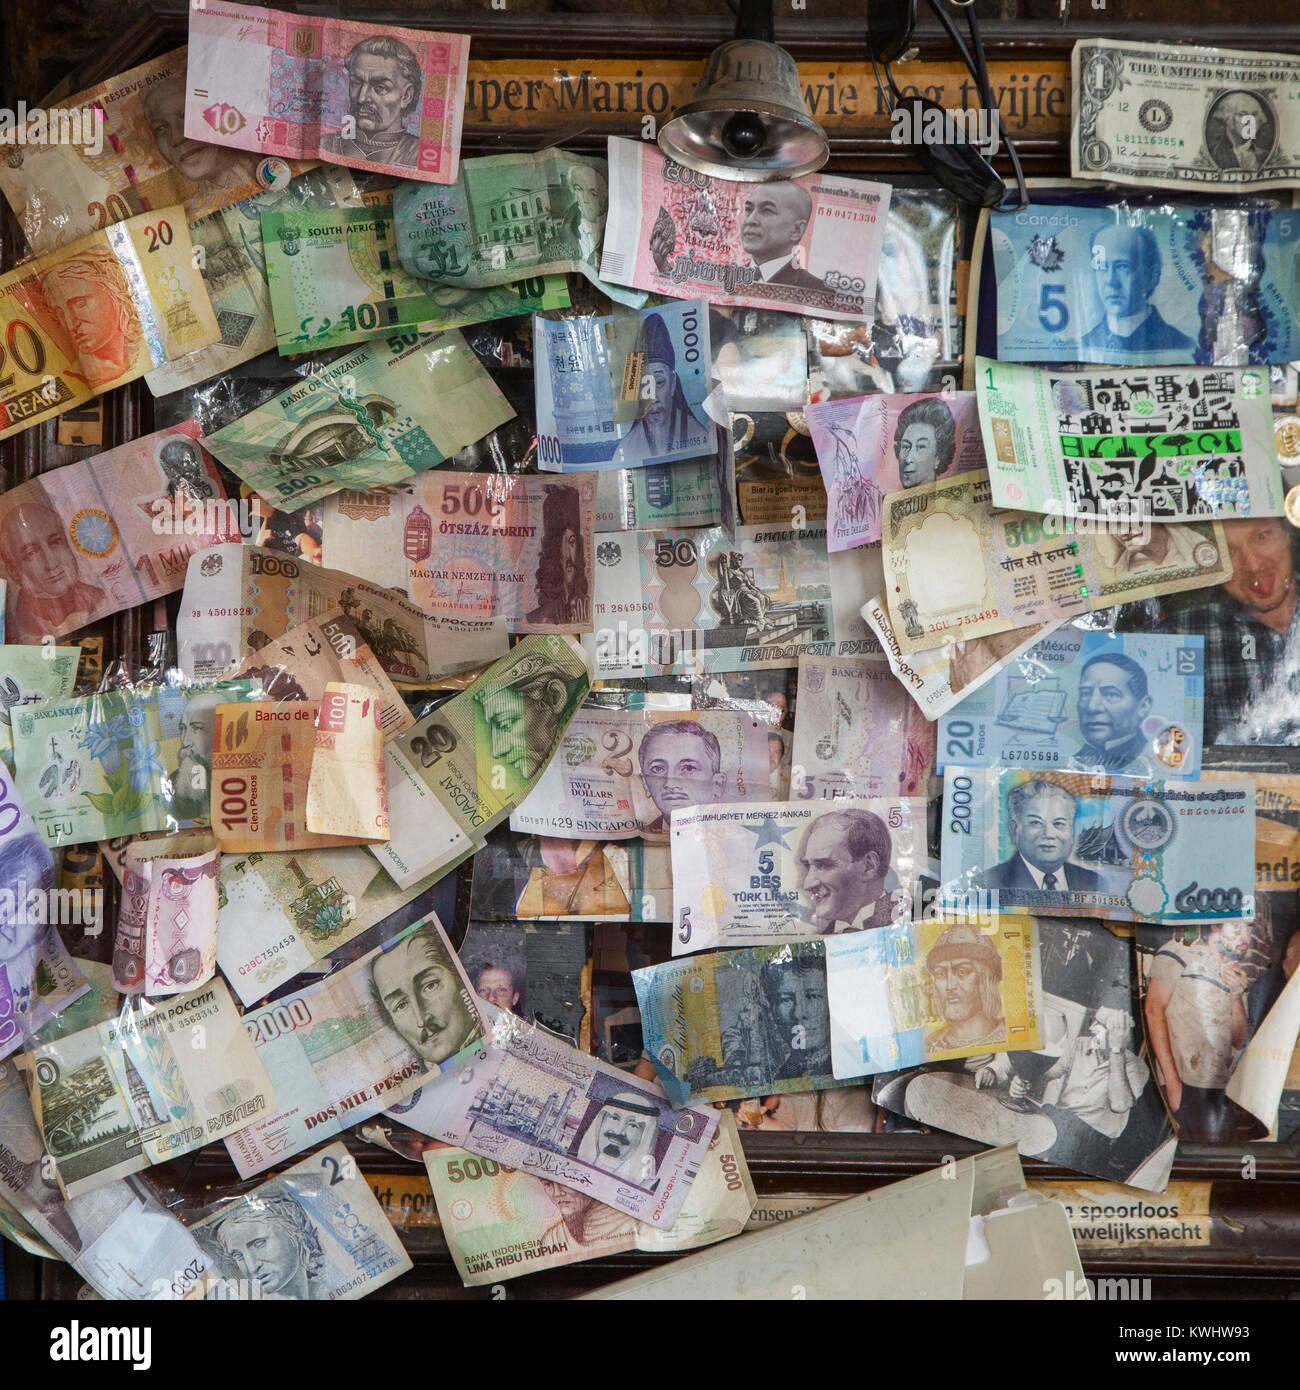 International banknotes / bank notes on the wall in Flemish café Het Waterhuis aan de Bierkant in the city - Stock Image